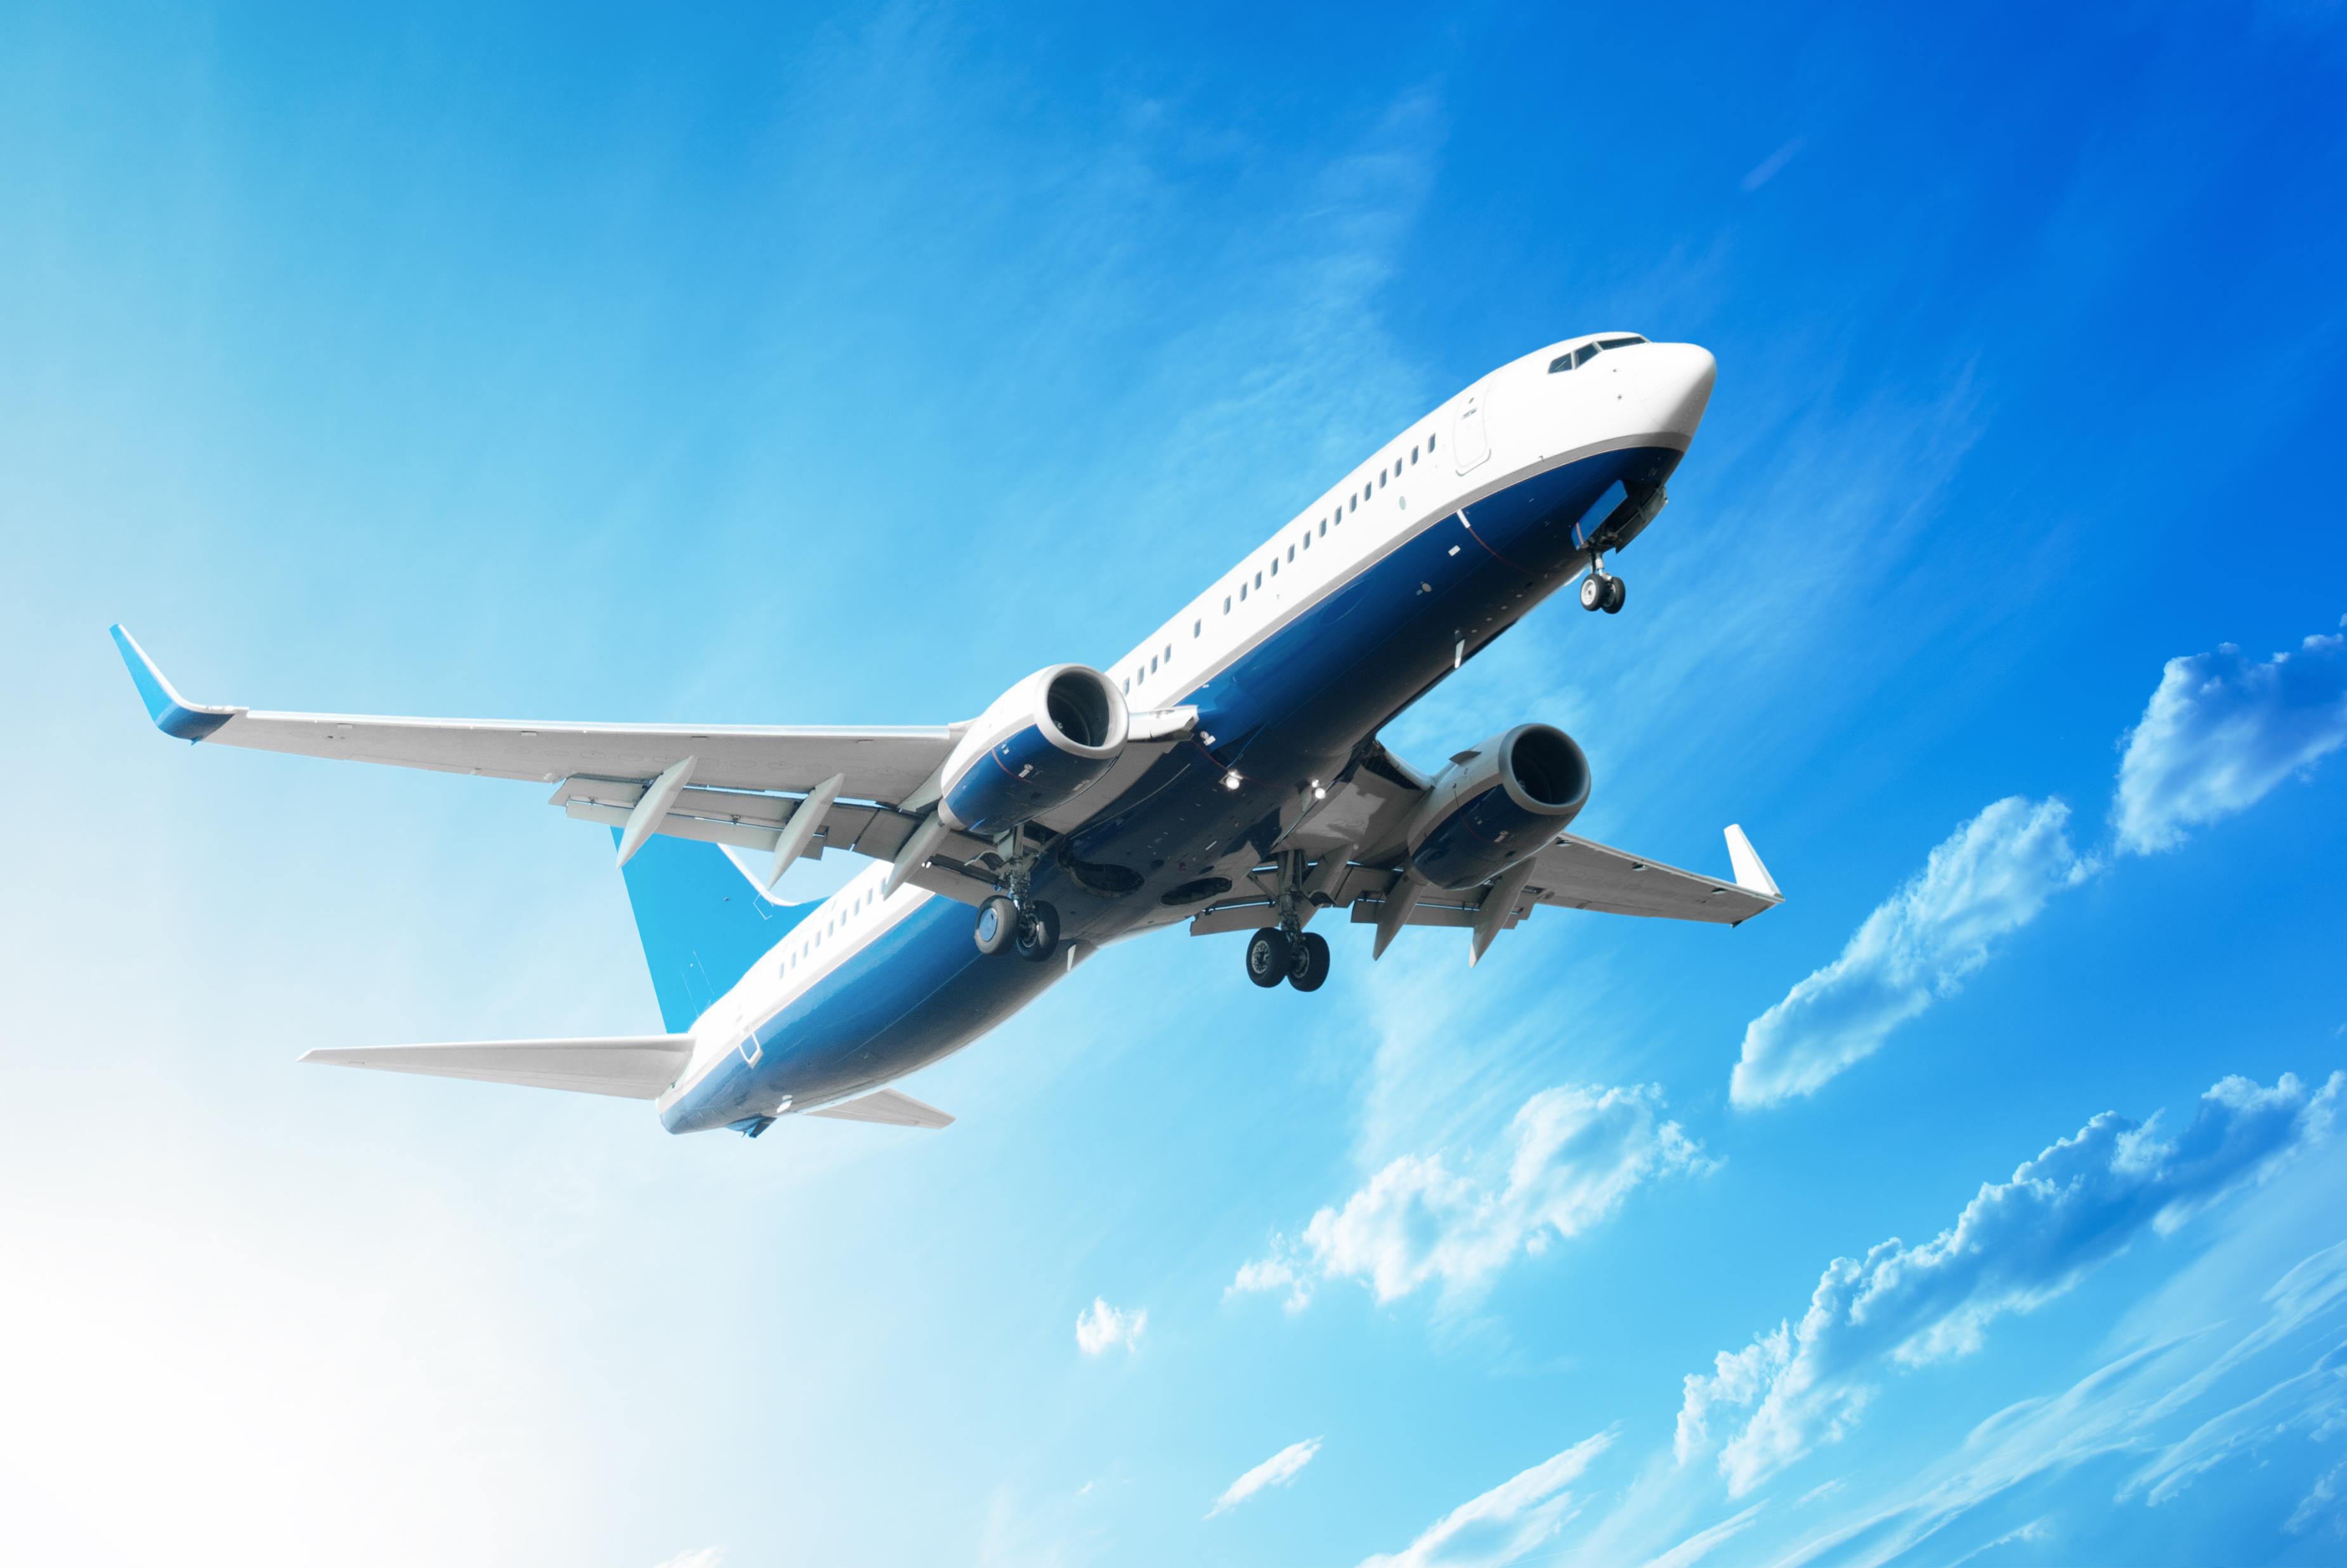 A passenger plane soaring into the sky.